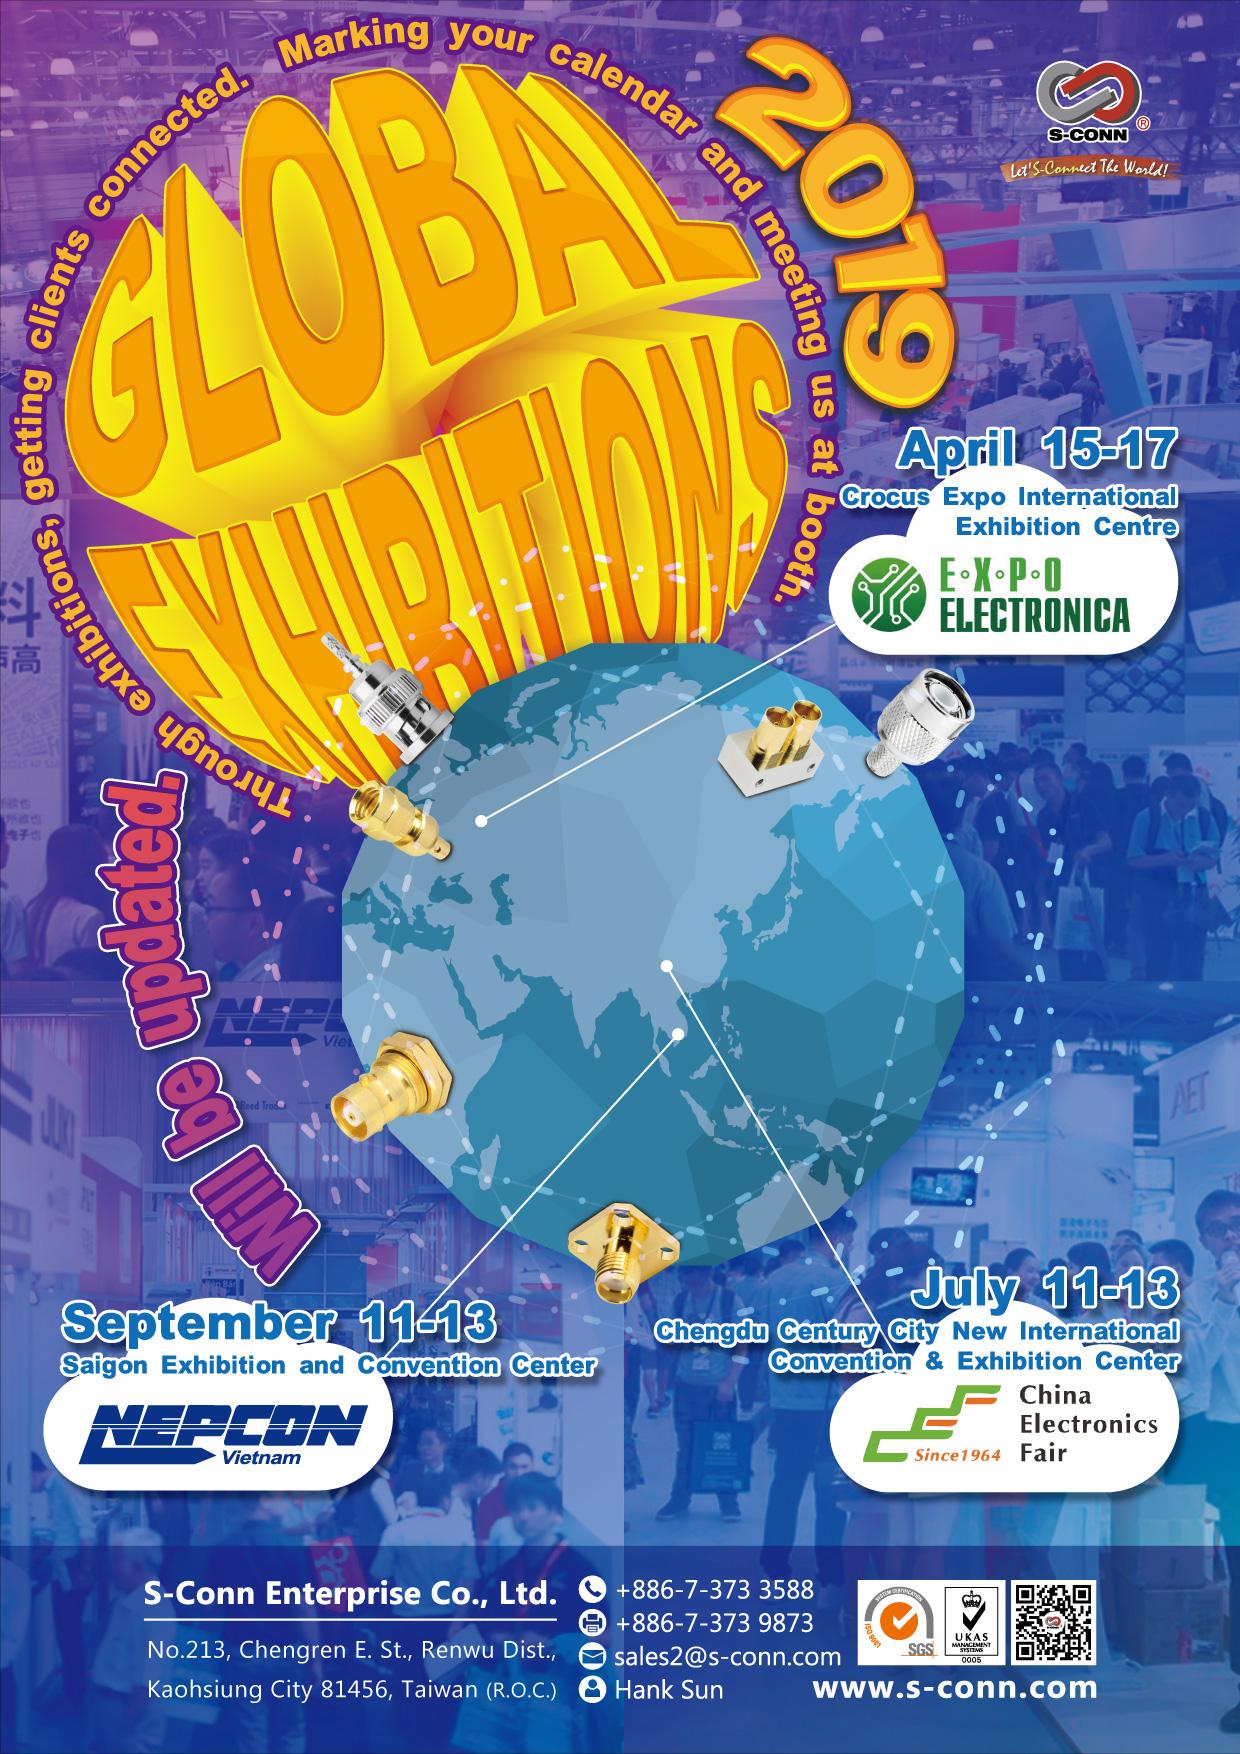 Global Exhibitions